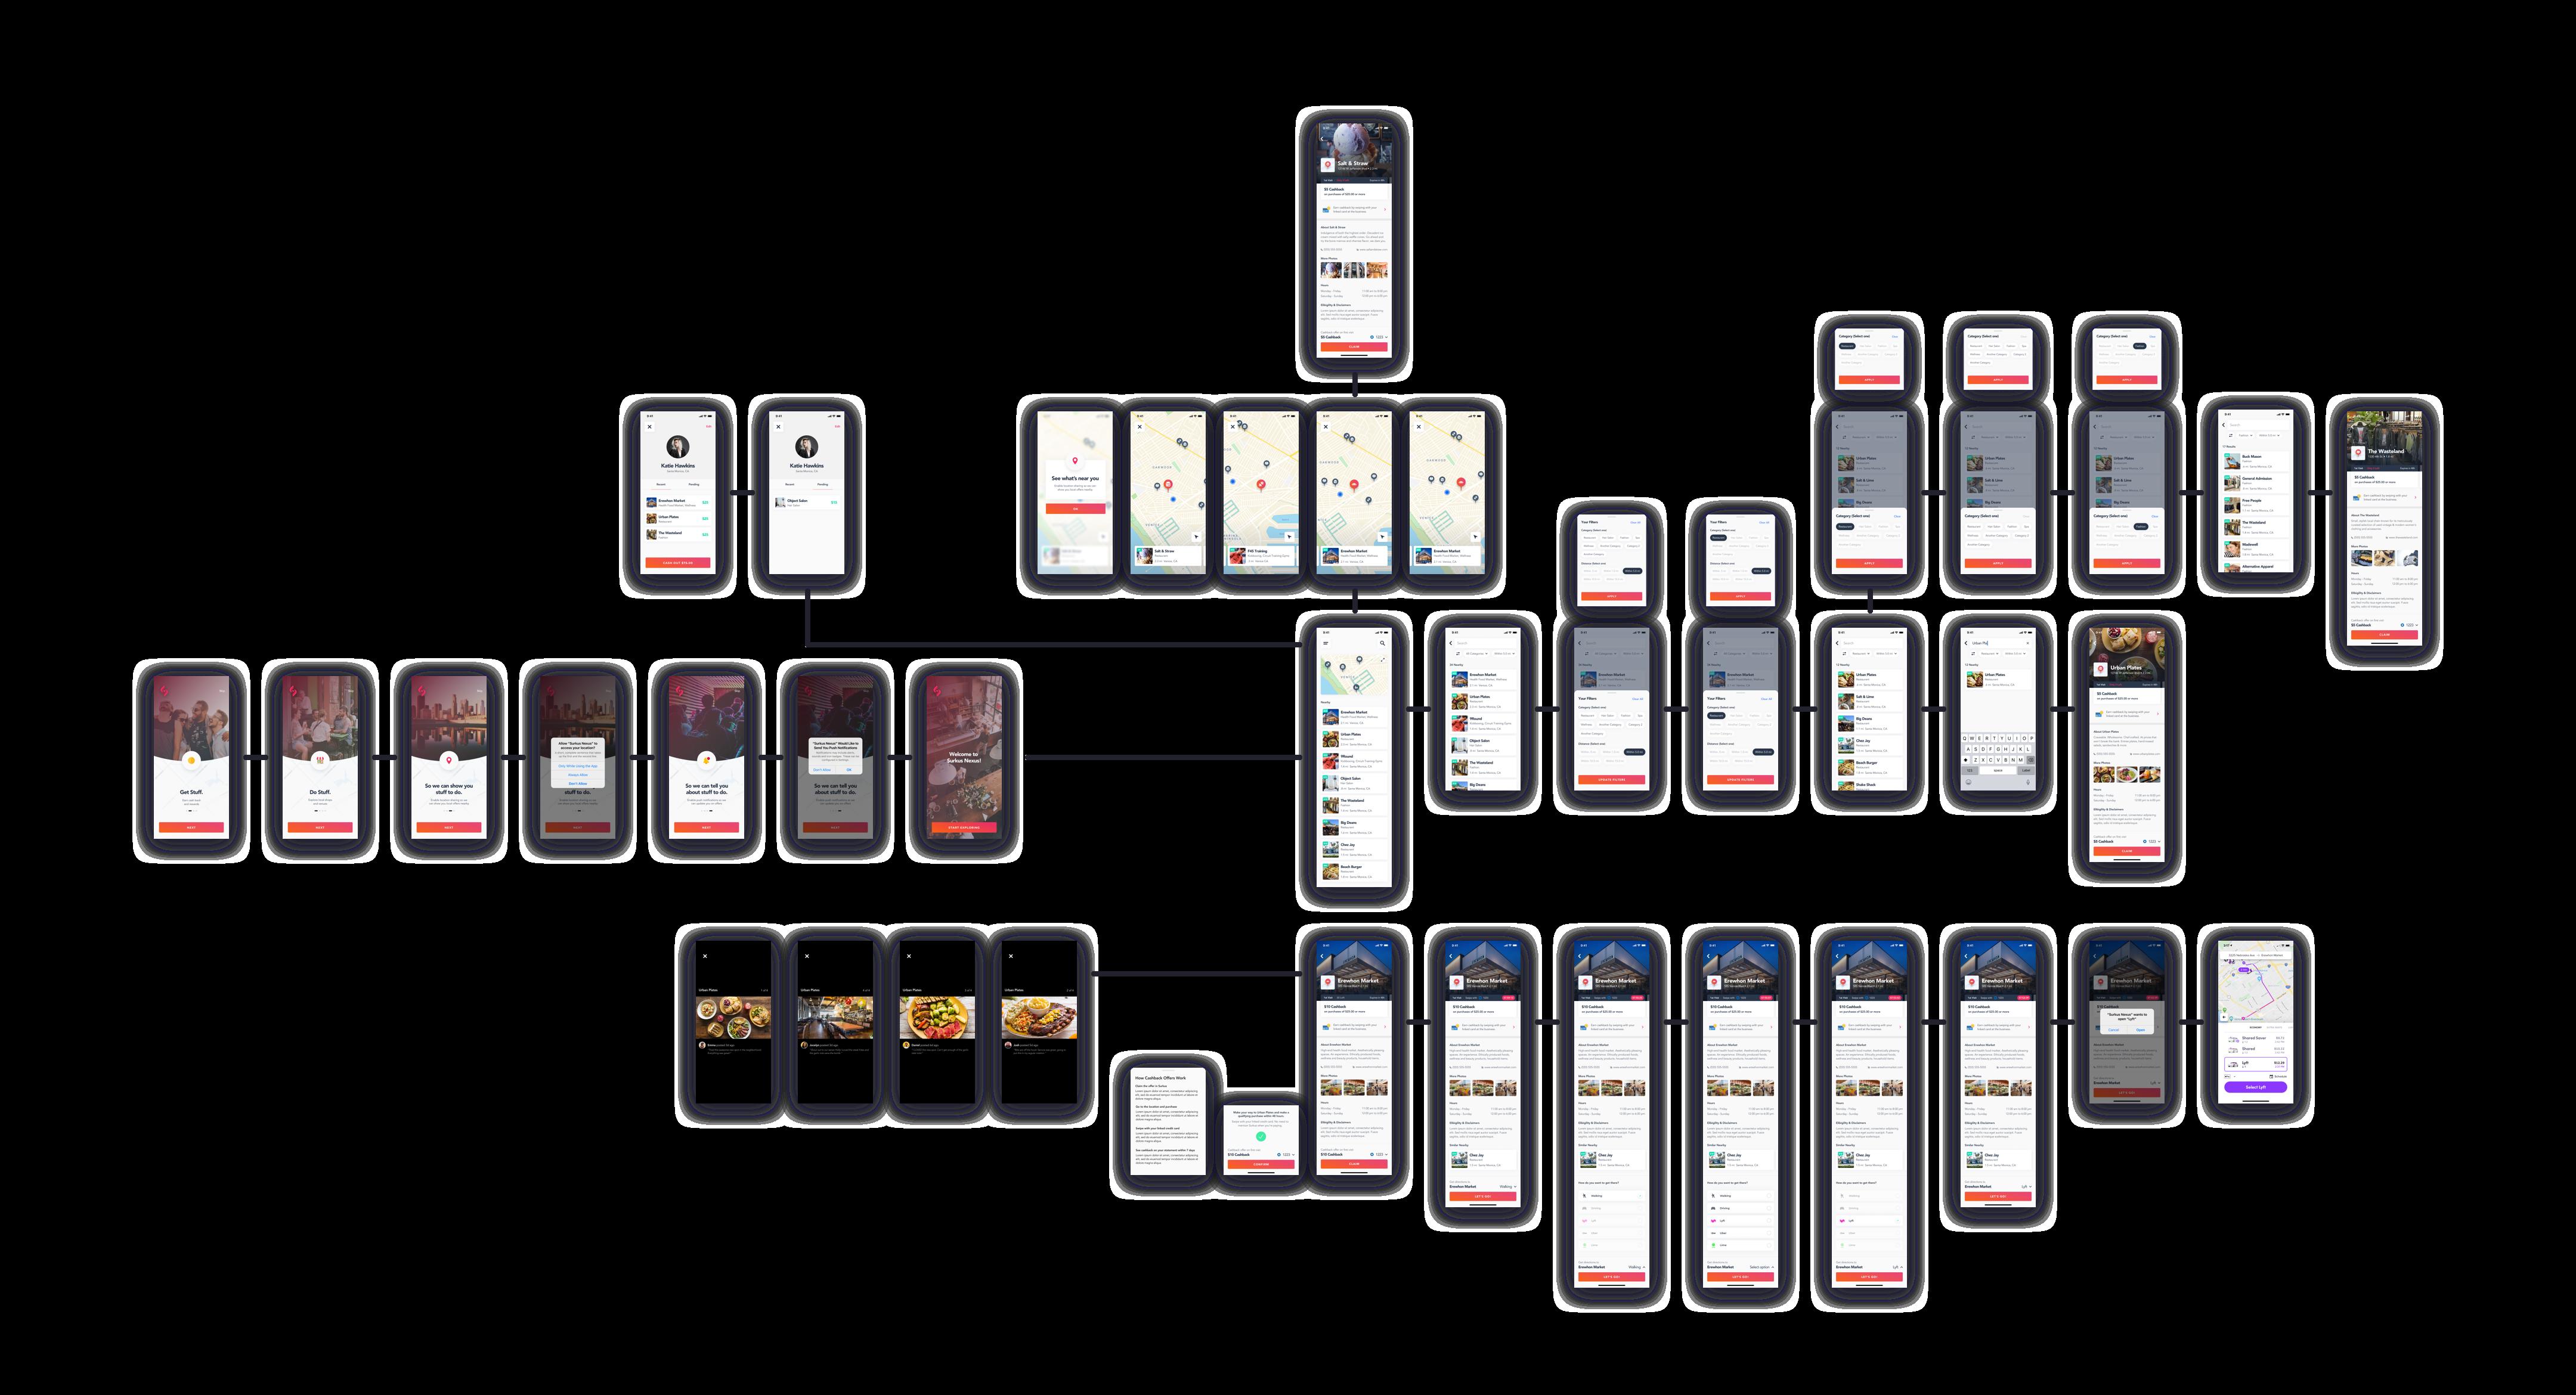 SurkusLocal-AssetPanel3-Prototype-L